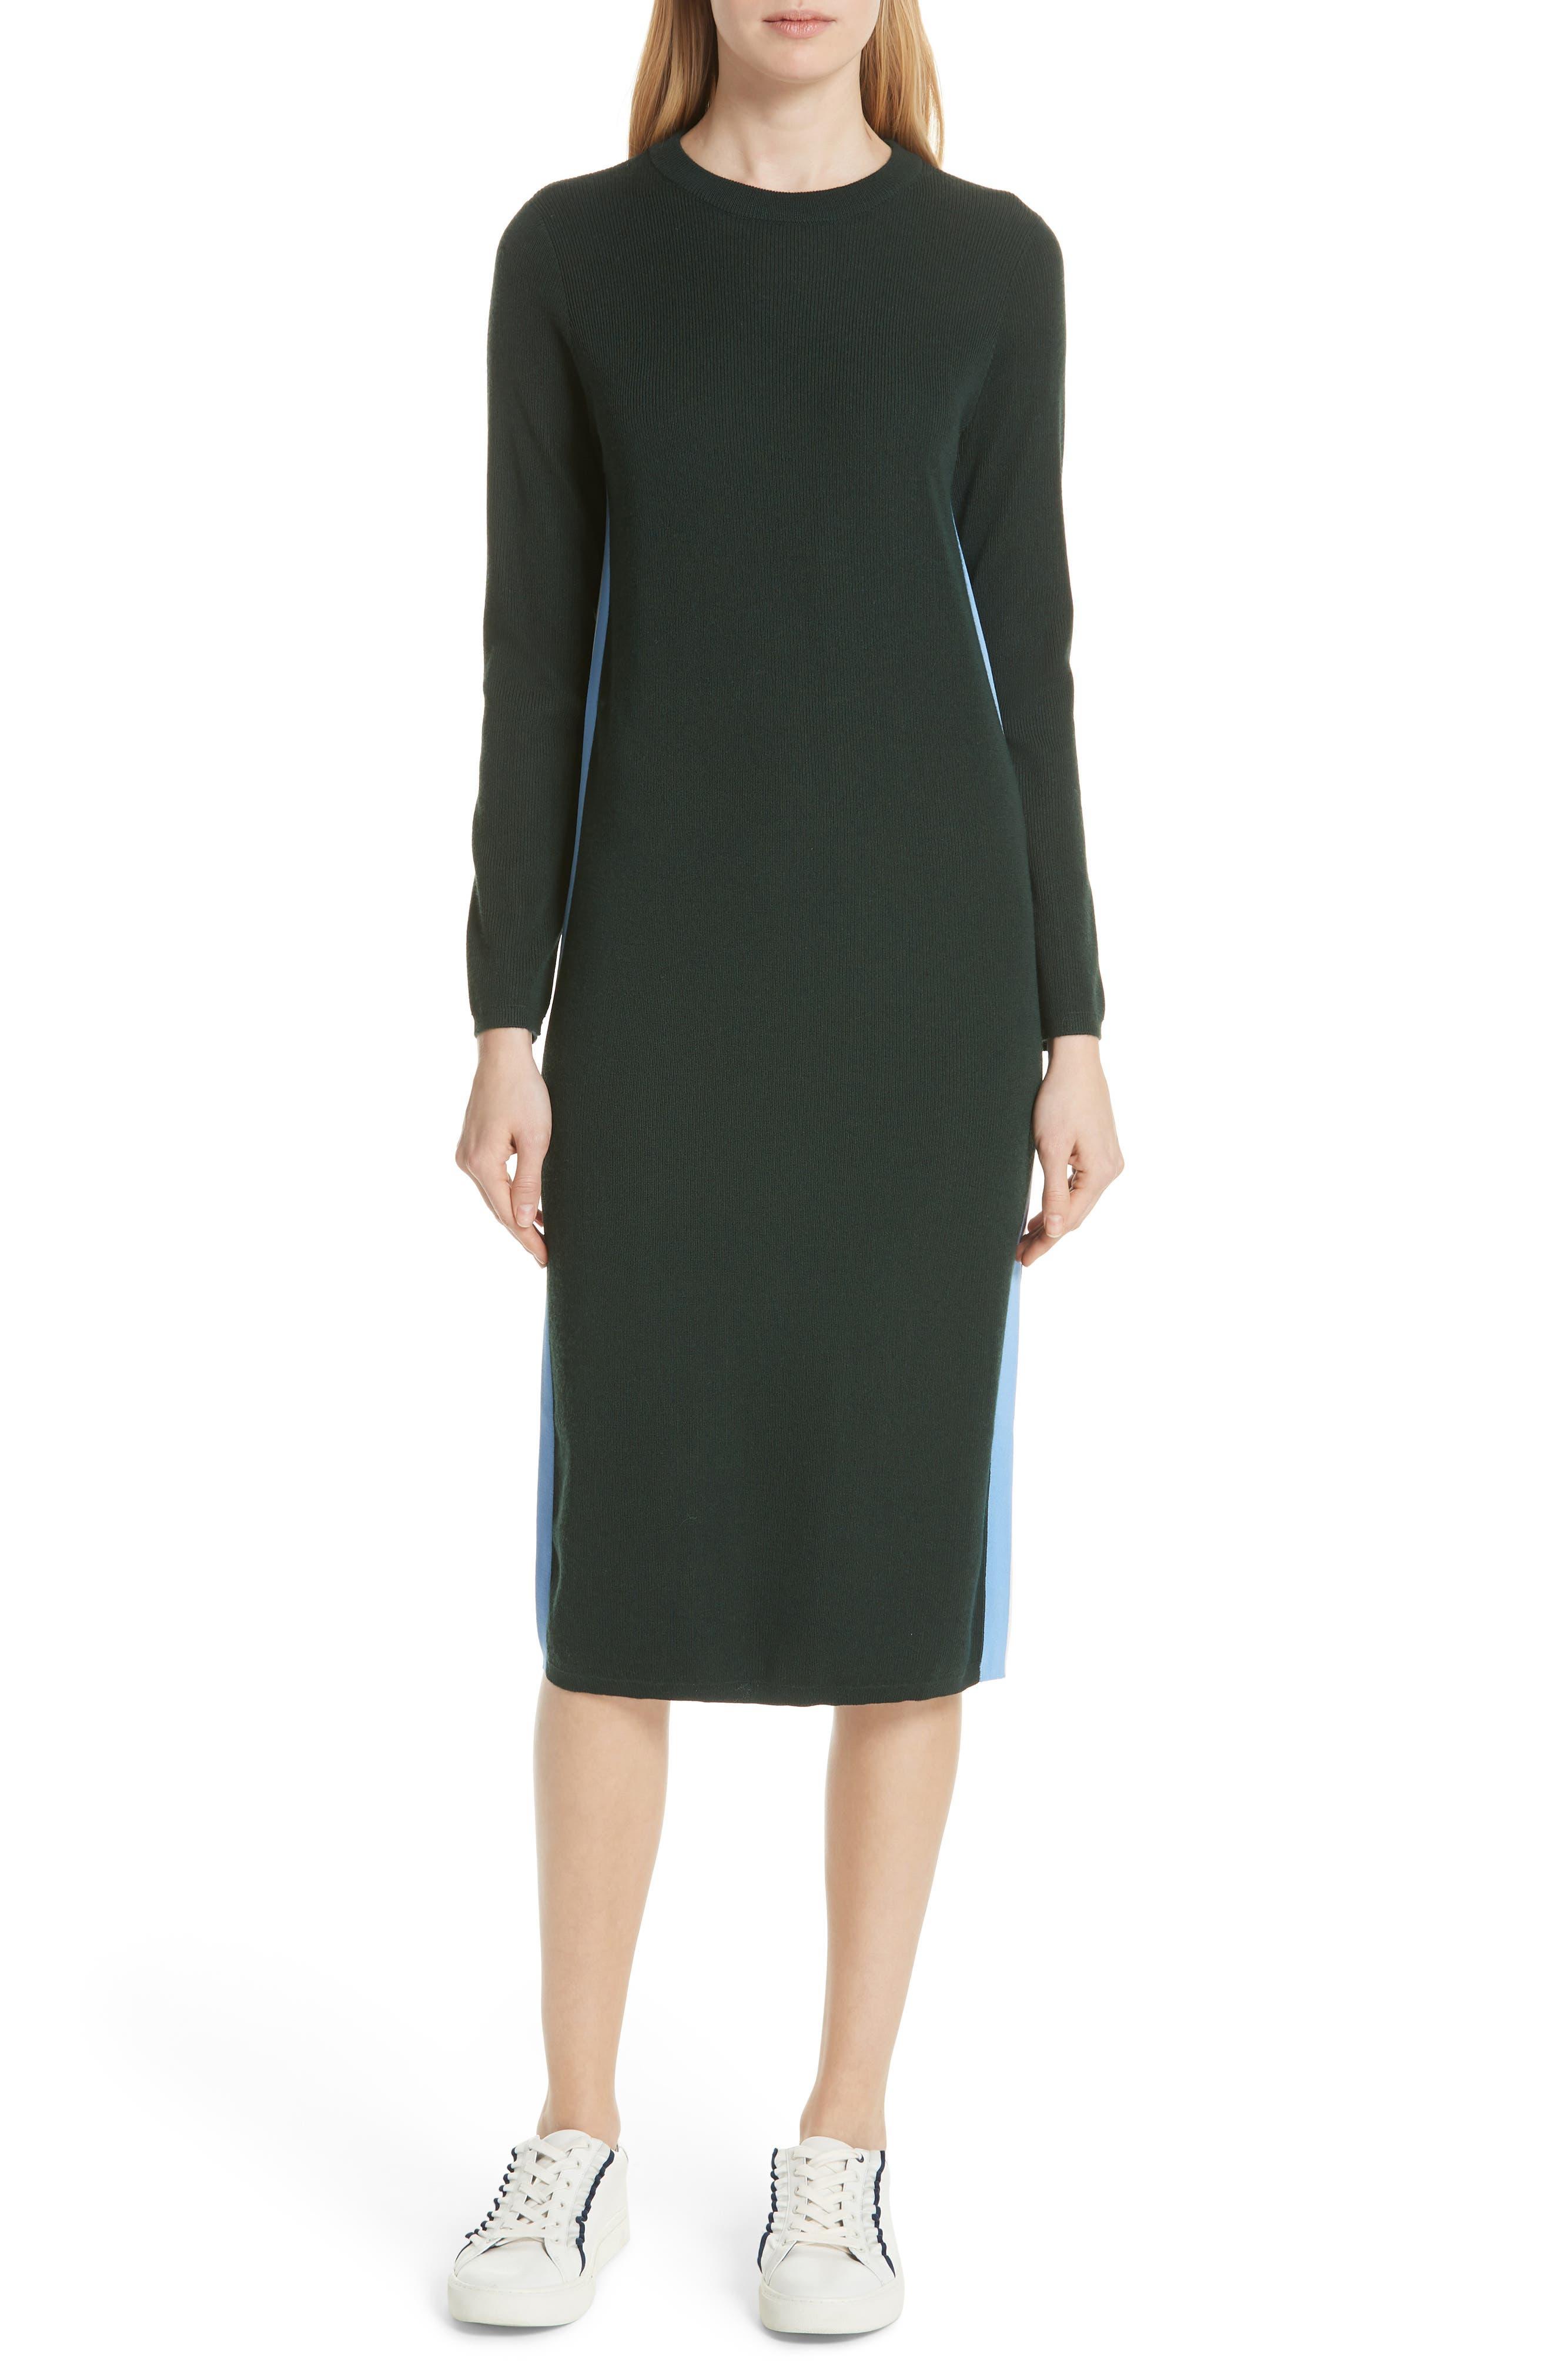 TORY SPORT Double Stripe Cashmere Blend Sweater Dress in Conifer